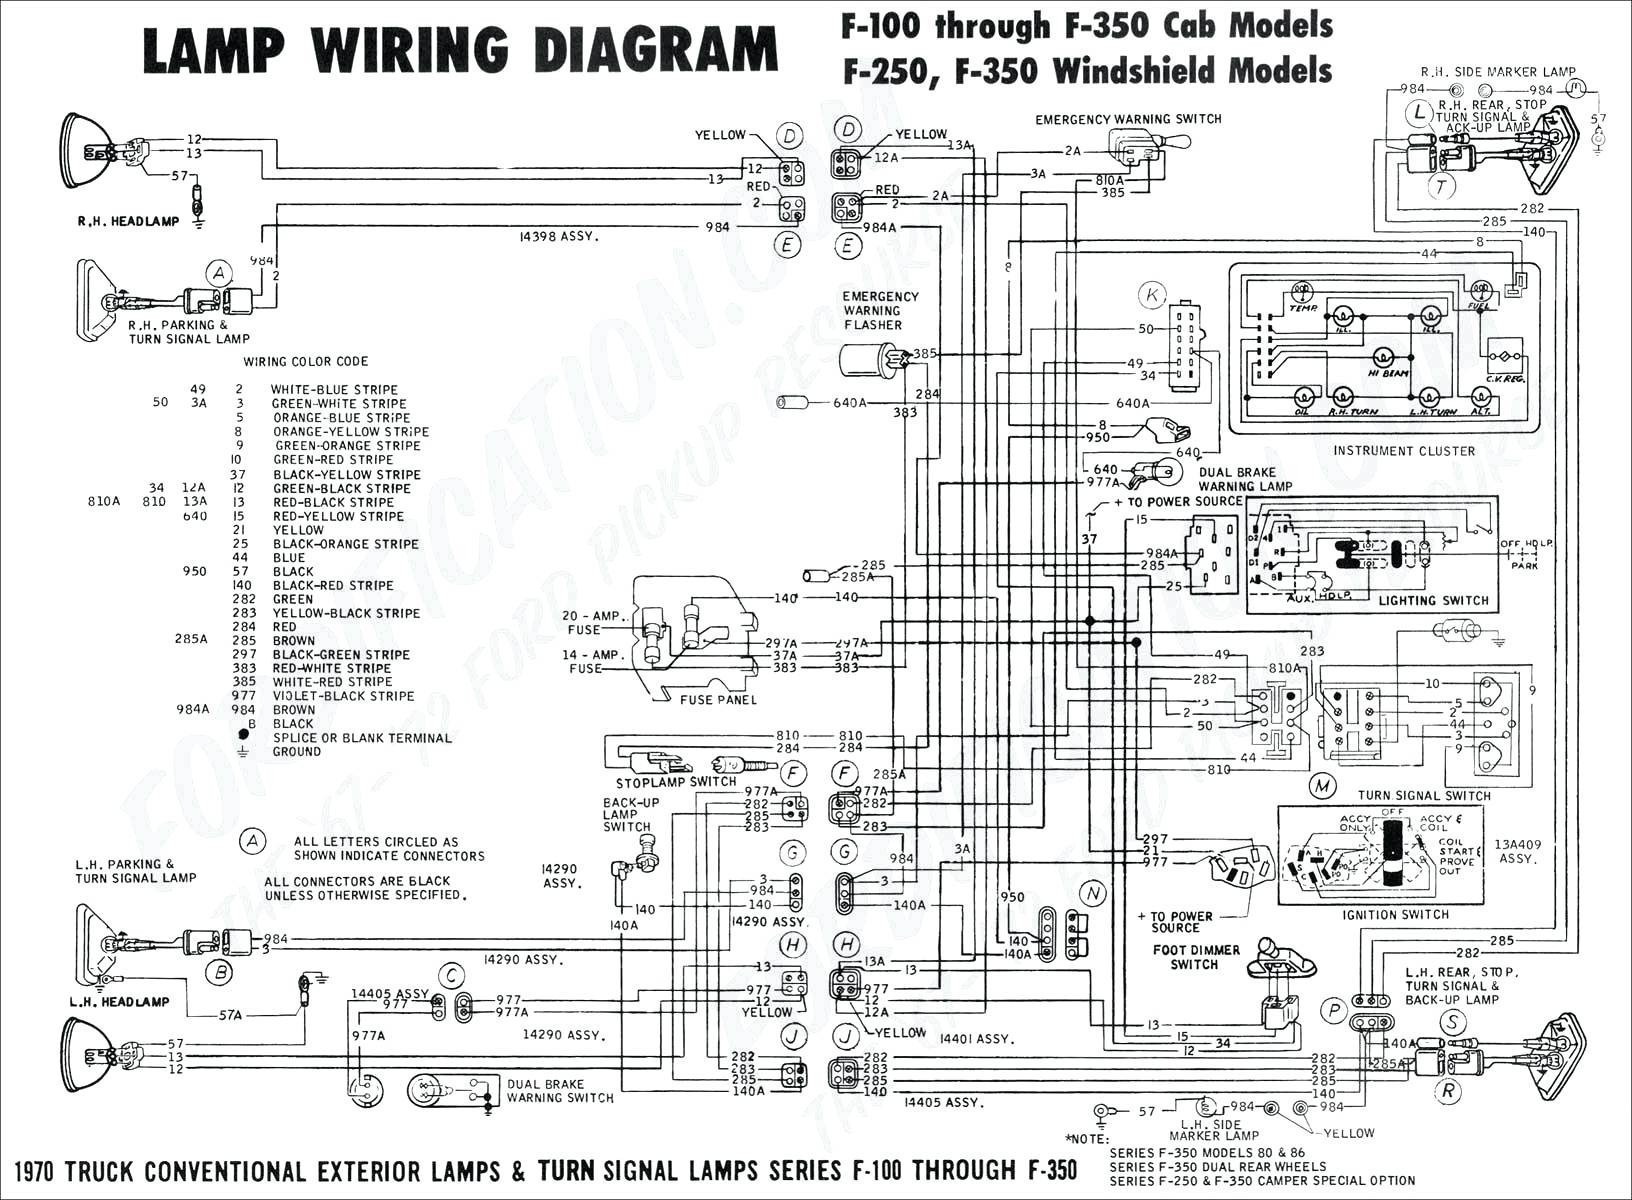 2001 Saturn Sl2 Engine Diagram 1999 Saturn Sl Fuse Box Wiring Diagram toolbox Of 2001 Saturn Sl2 Engine Diagram